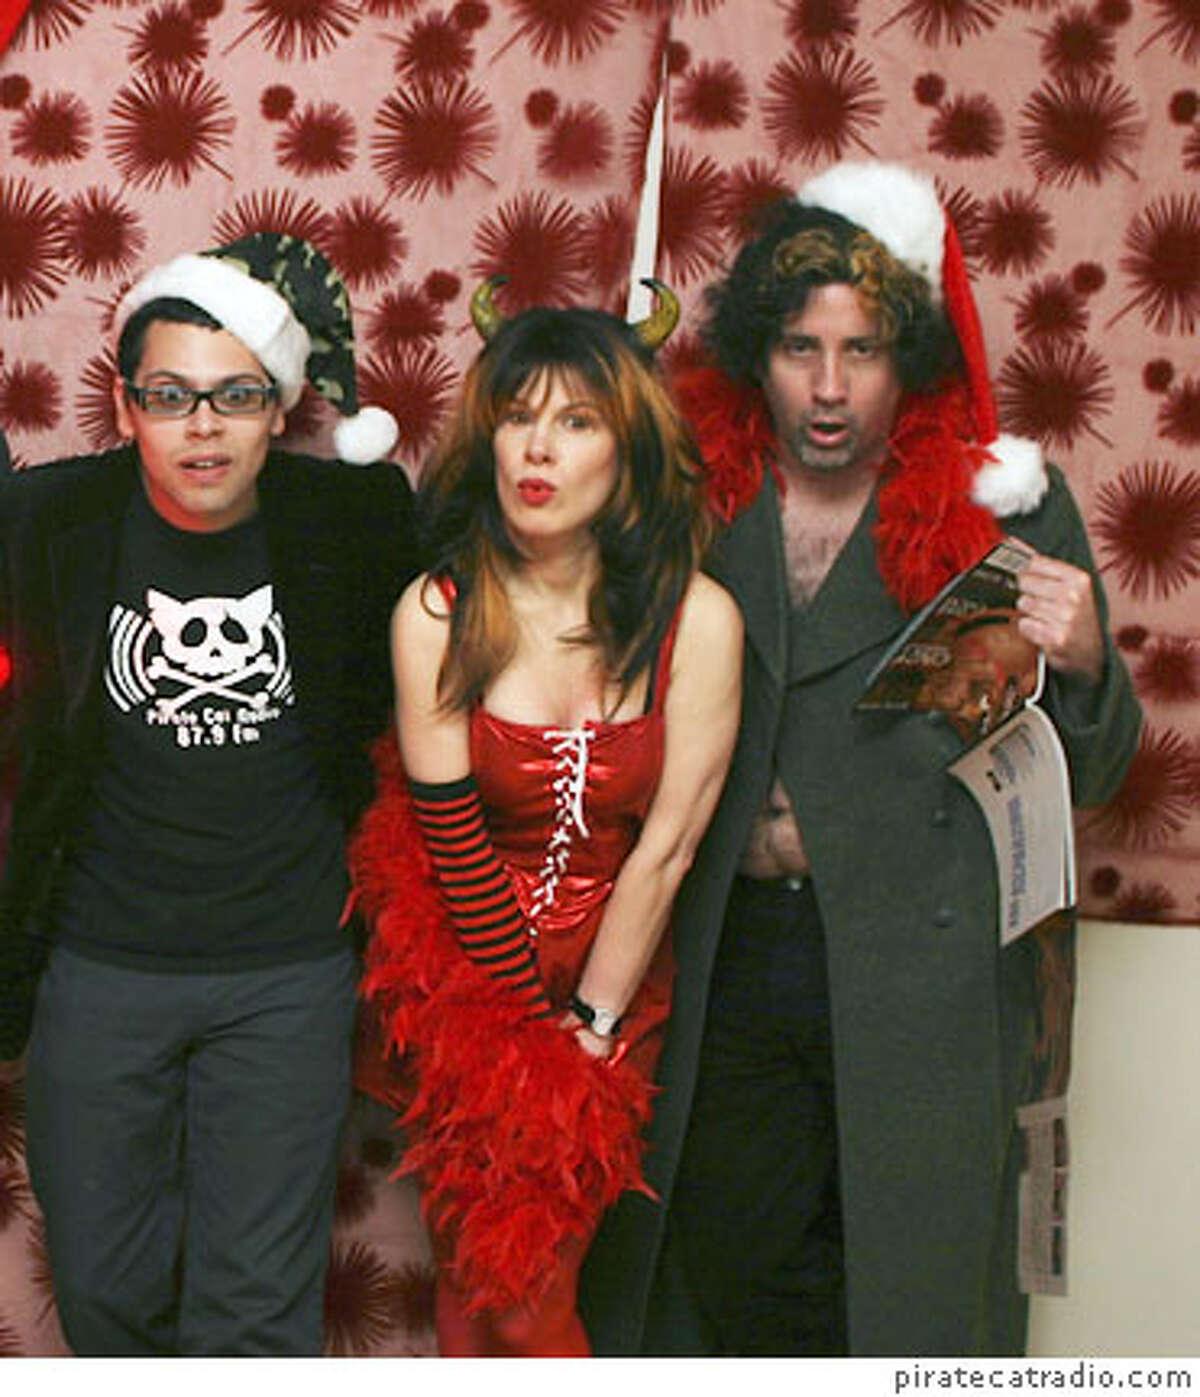 L-R: Monkeyman, Karla LaVey, Stoo Odom - participants in Black X Mass. Photo credit: piratecatradio.com